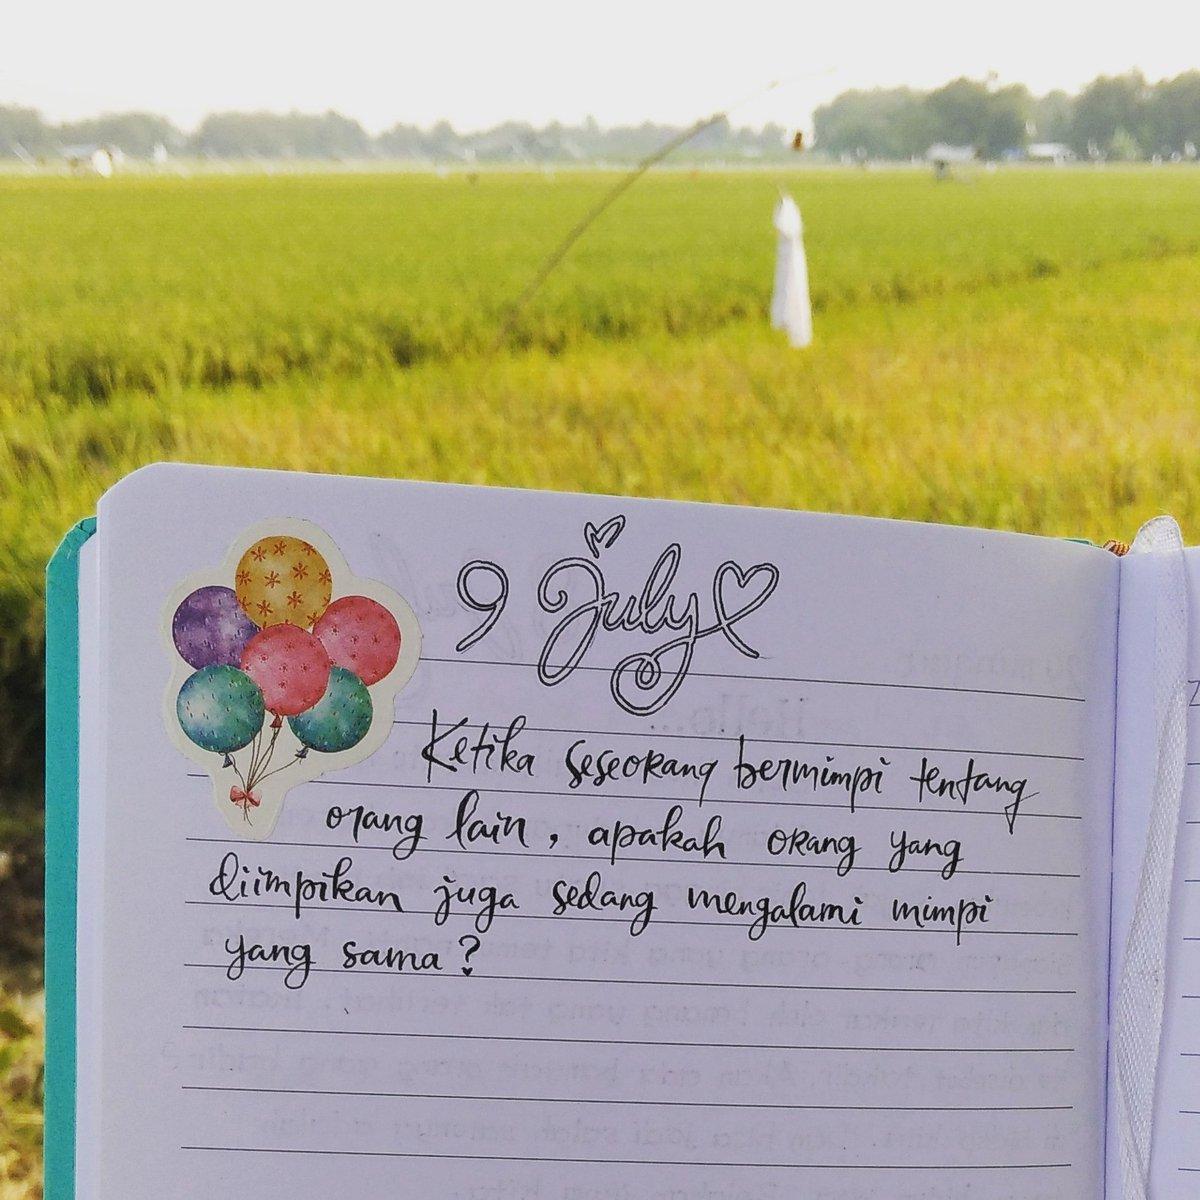 #stopbukubajakan #NKCTHI #poempm #doodle #illustration #bagijurus #loverstopia #lfl #lightroom #artoftheday #katakerja #planneraddictindonesia #typography #dhkandthesweetpaper #handlettering #tulisantangan #dreamcatcher #baitsemusim #bookstagramindonesia #bulletjournal #patihitspic.twitter.com/26woGolRPi